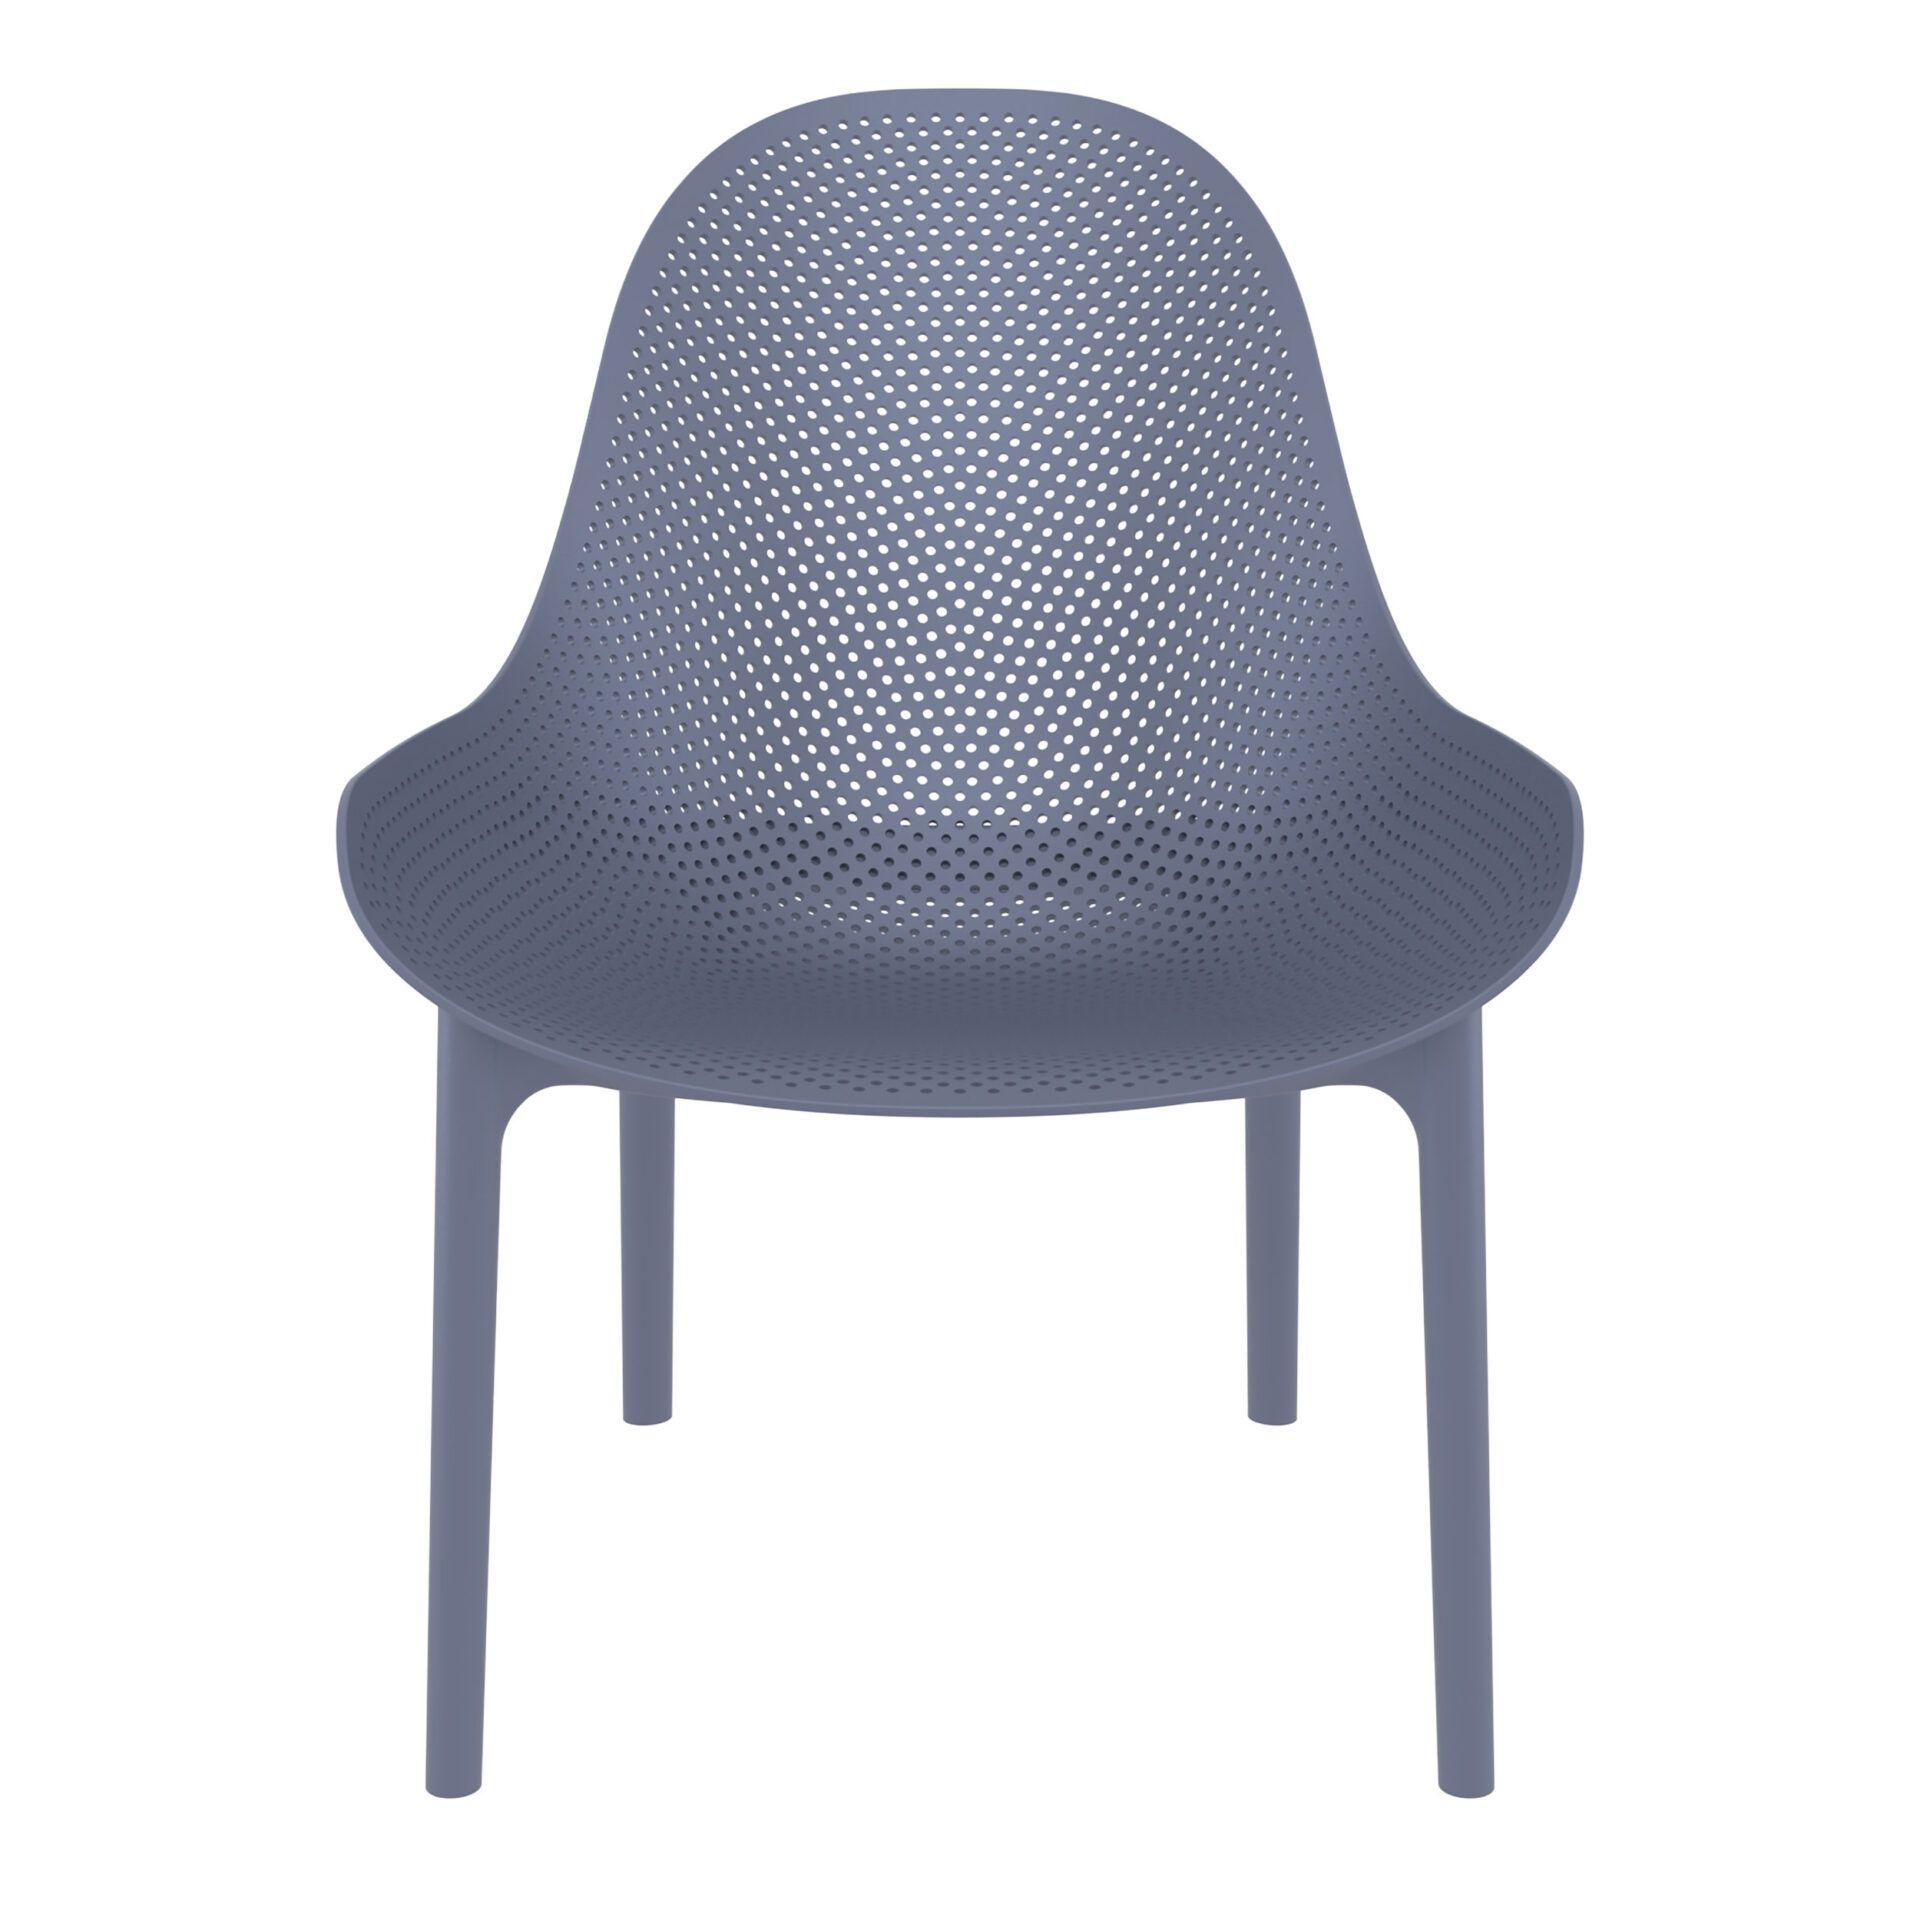 outdoor seating polypropylene sky lounge darkgrey front